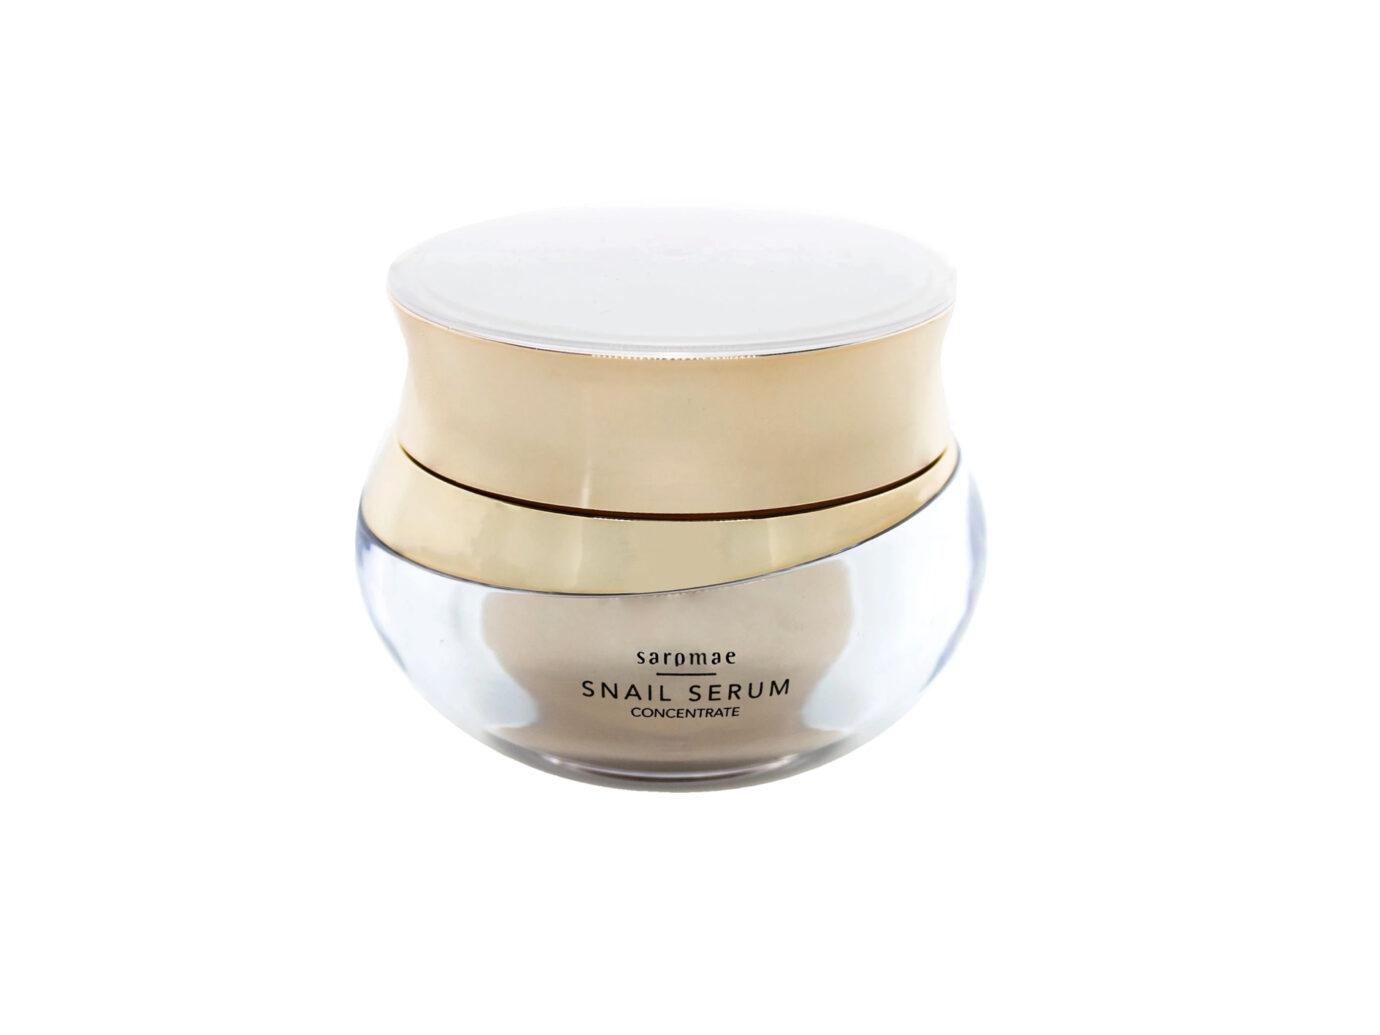 SMD Cosmetics Saromae Snail Serum Concentrate